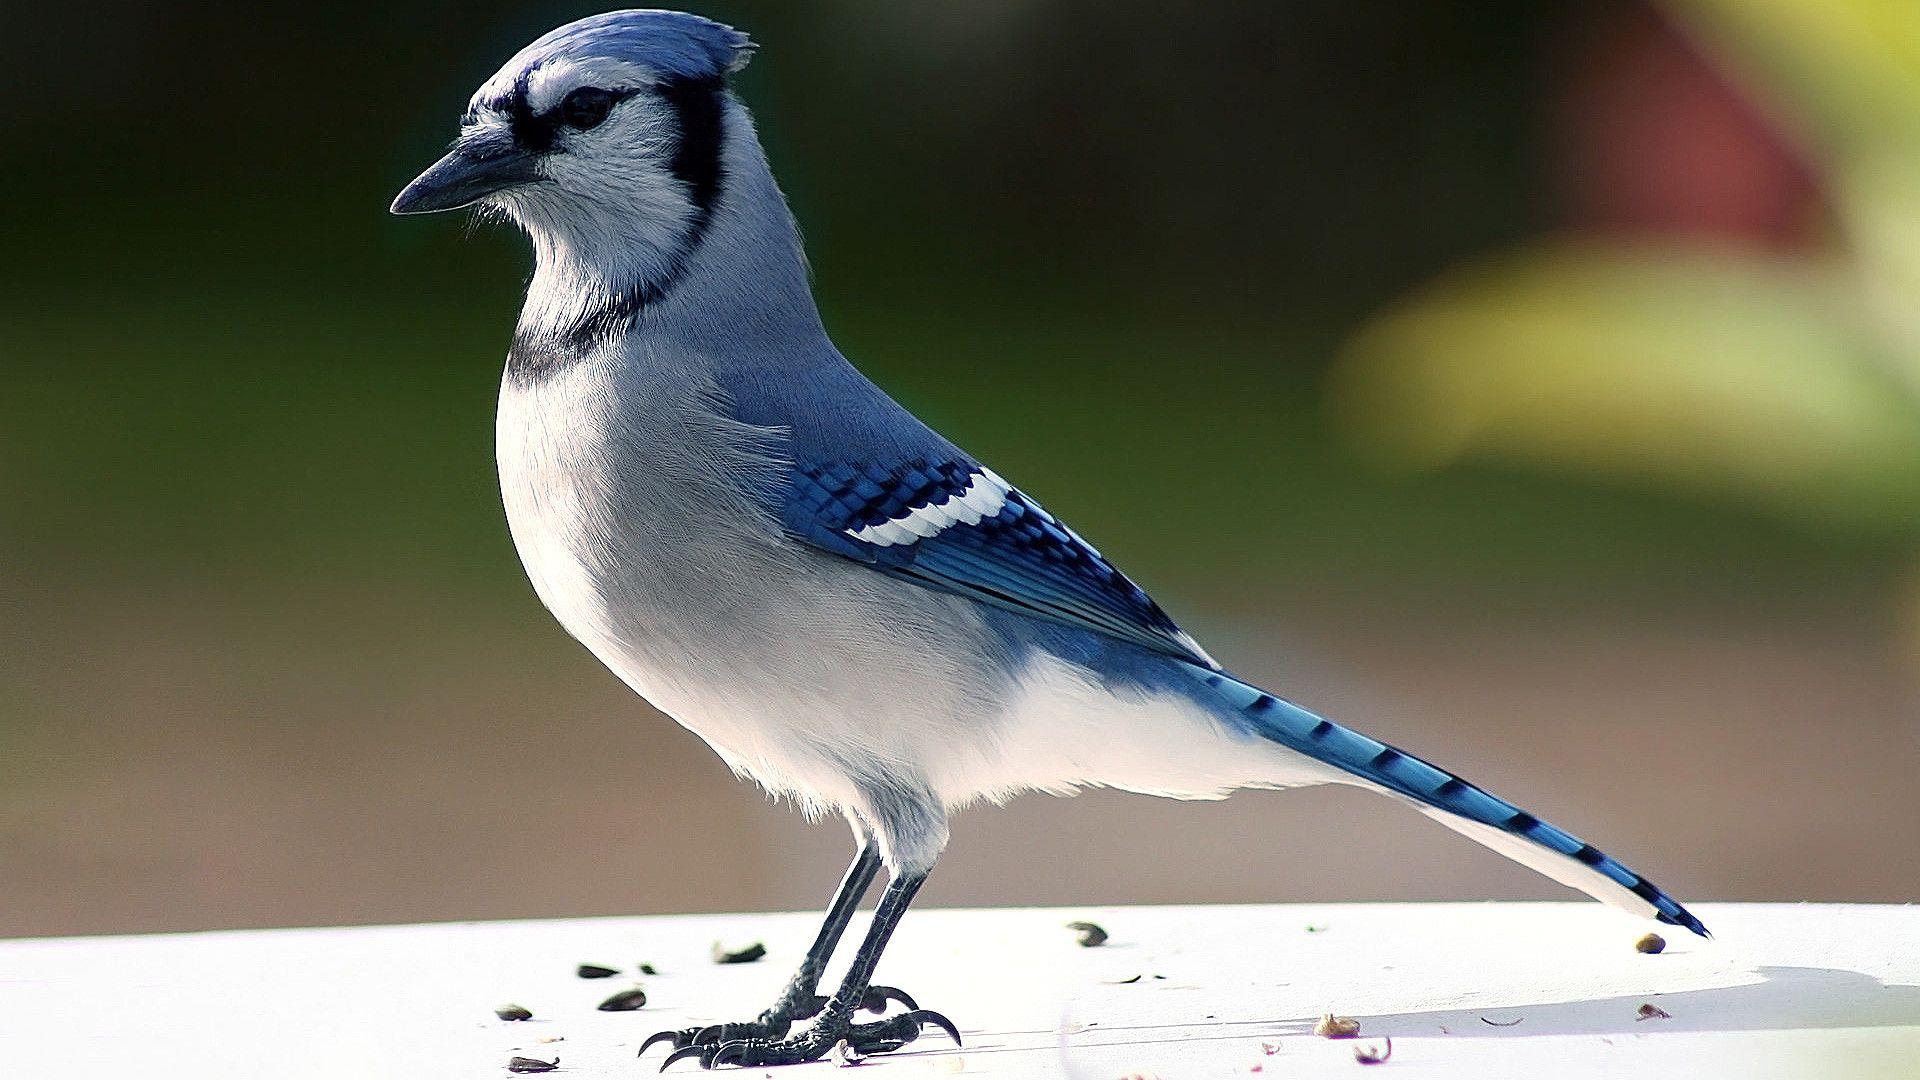 Blue Jays wallpaper image hd